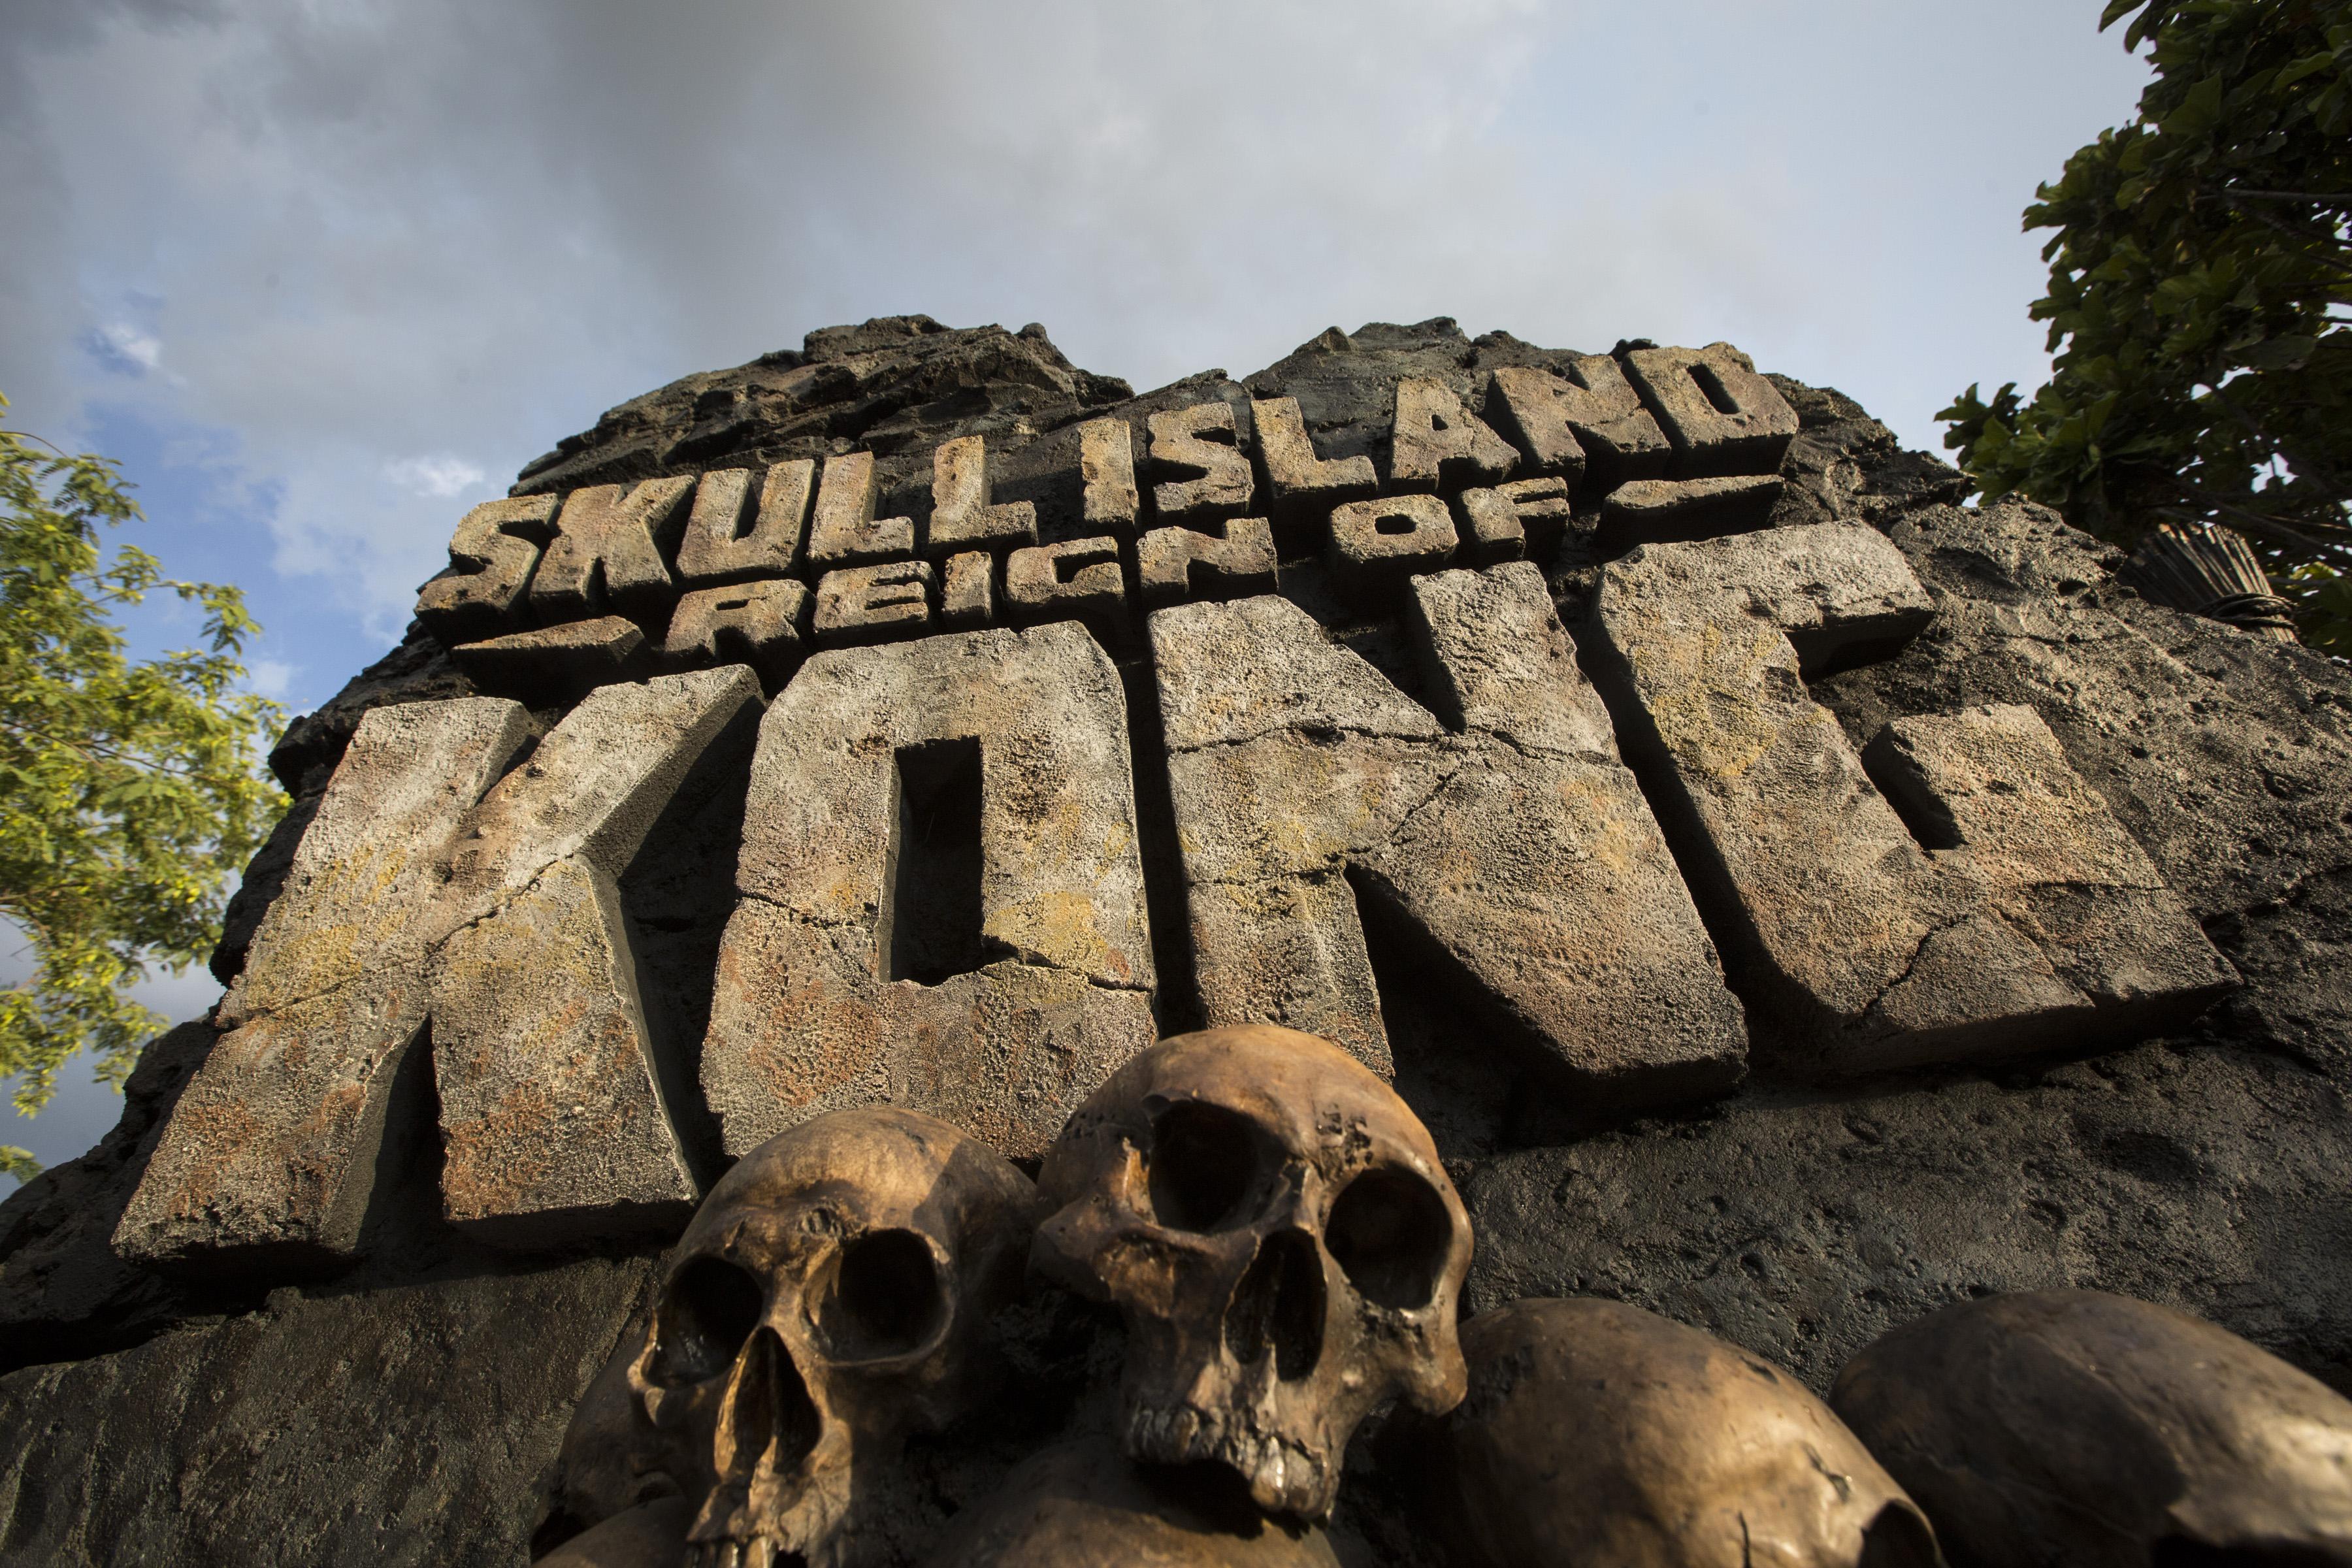 Publicity, signage, Skull Island: Reign of Kong, SIROK, Universal's Islands of Adventure, IOA, Universal Orlando Resort, UOR